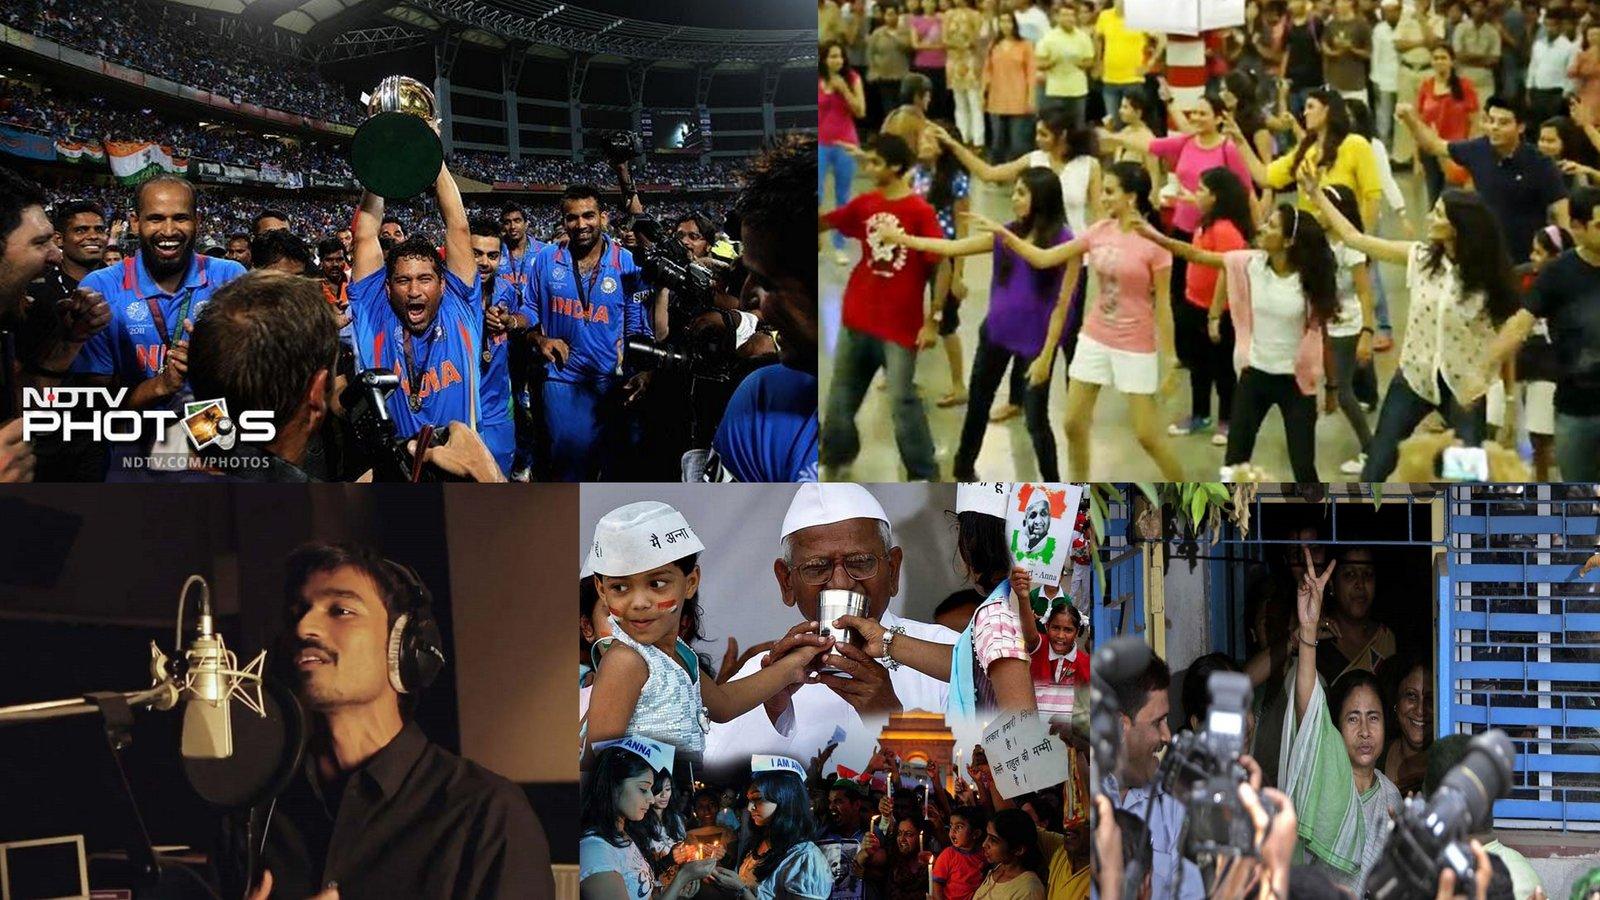 Chak De India full movie in hindi download mp4